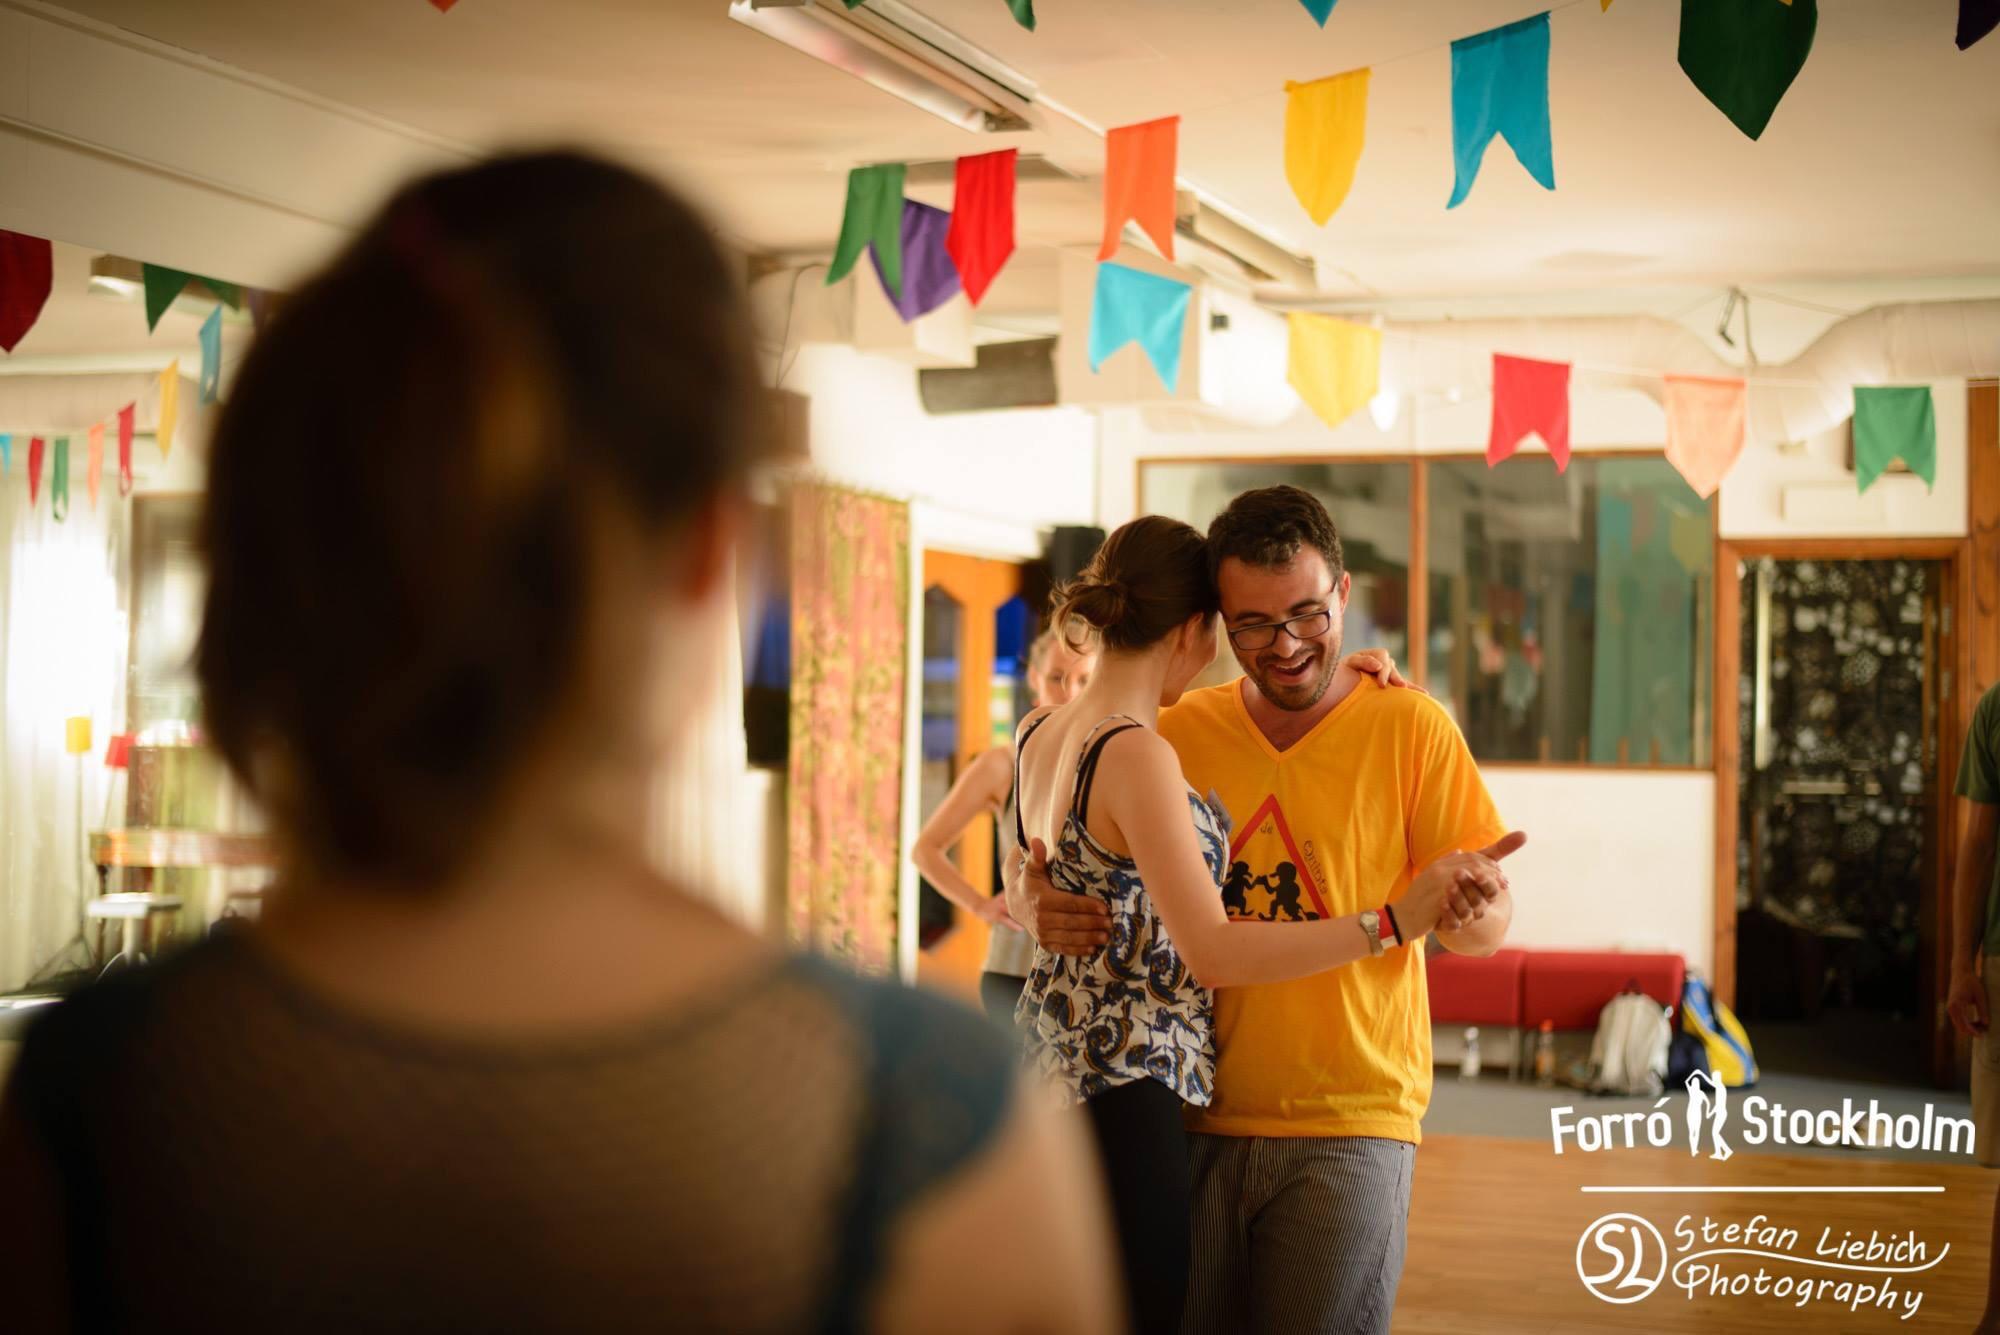 http://forrofestival.com/wp-content/uploads/2016/12/bruno-figueiredo-casal.jpg